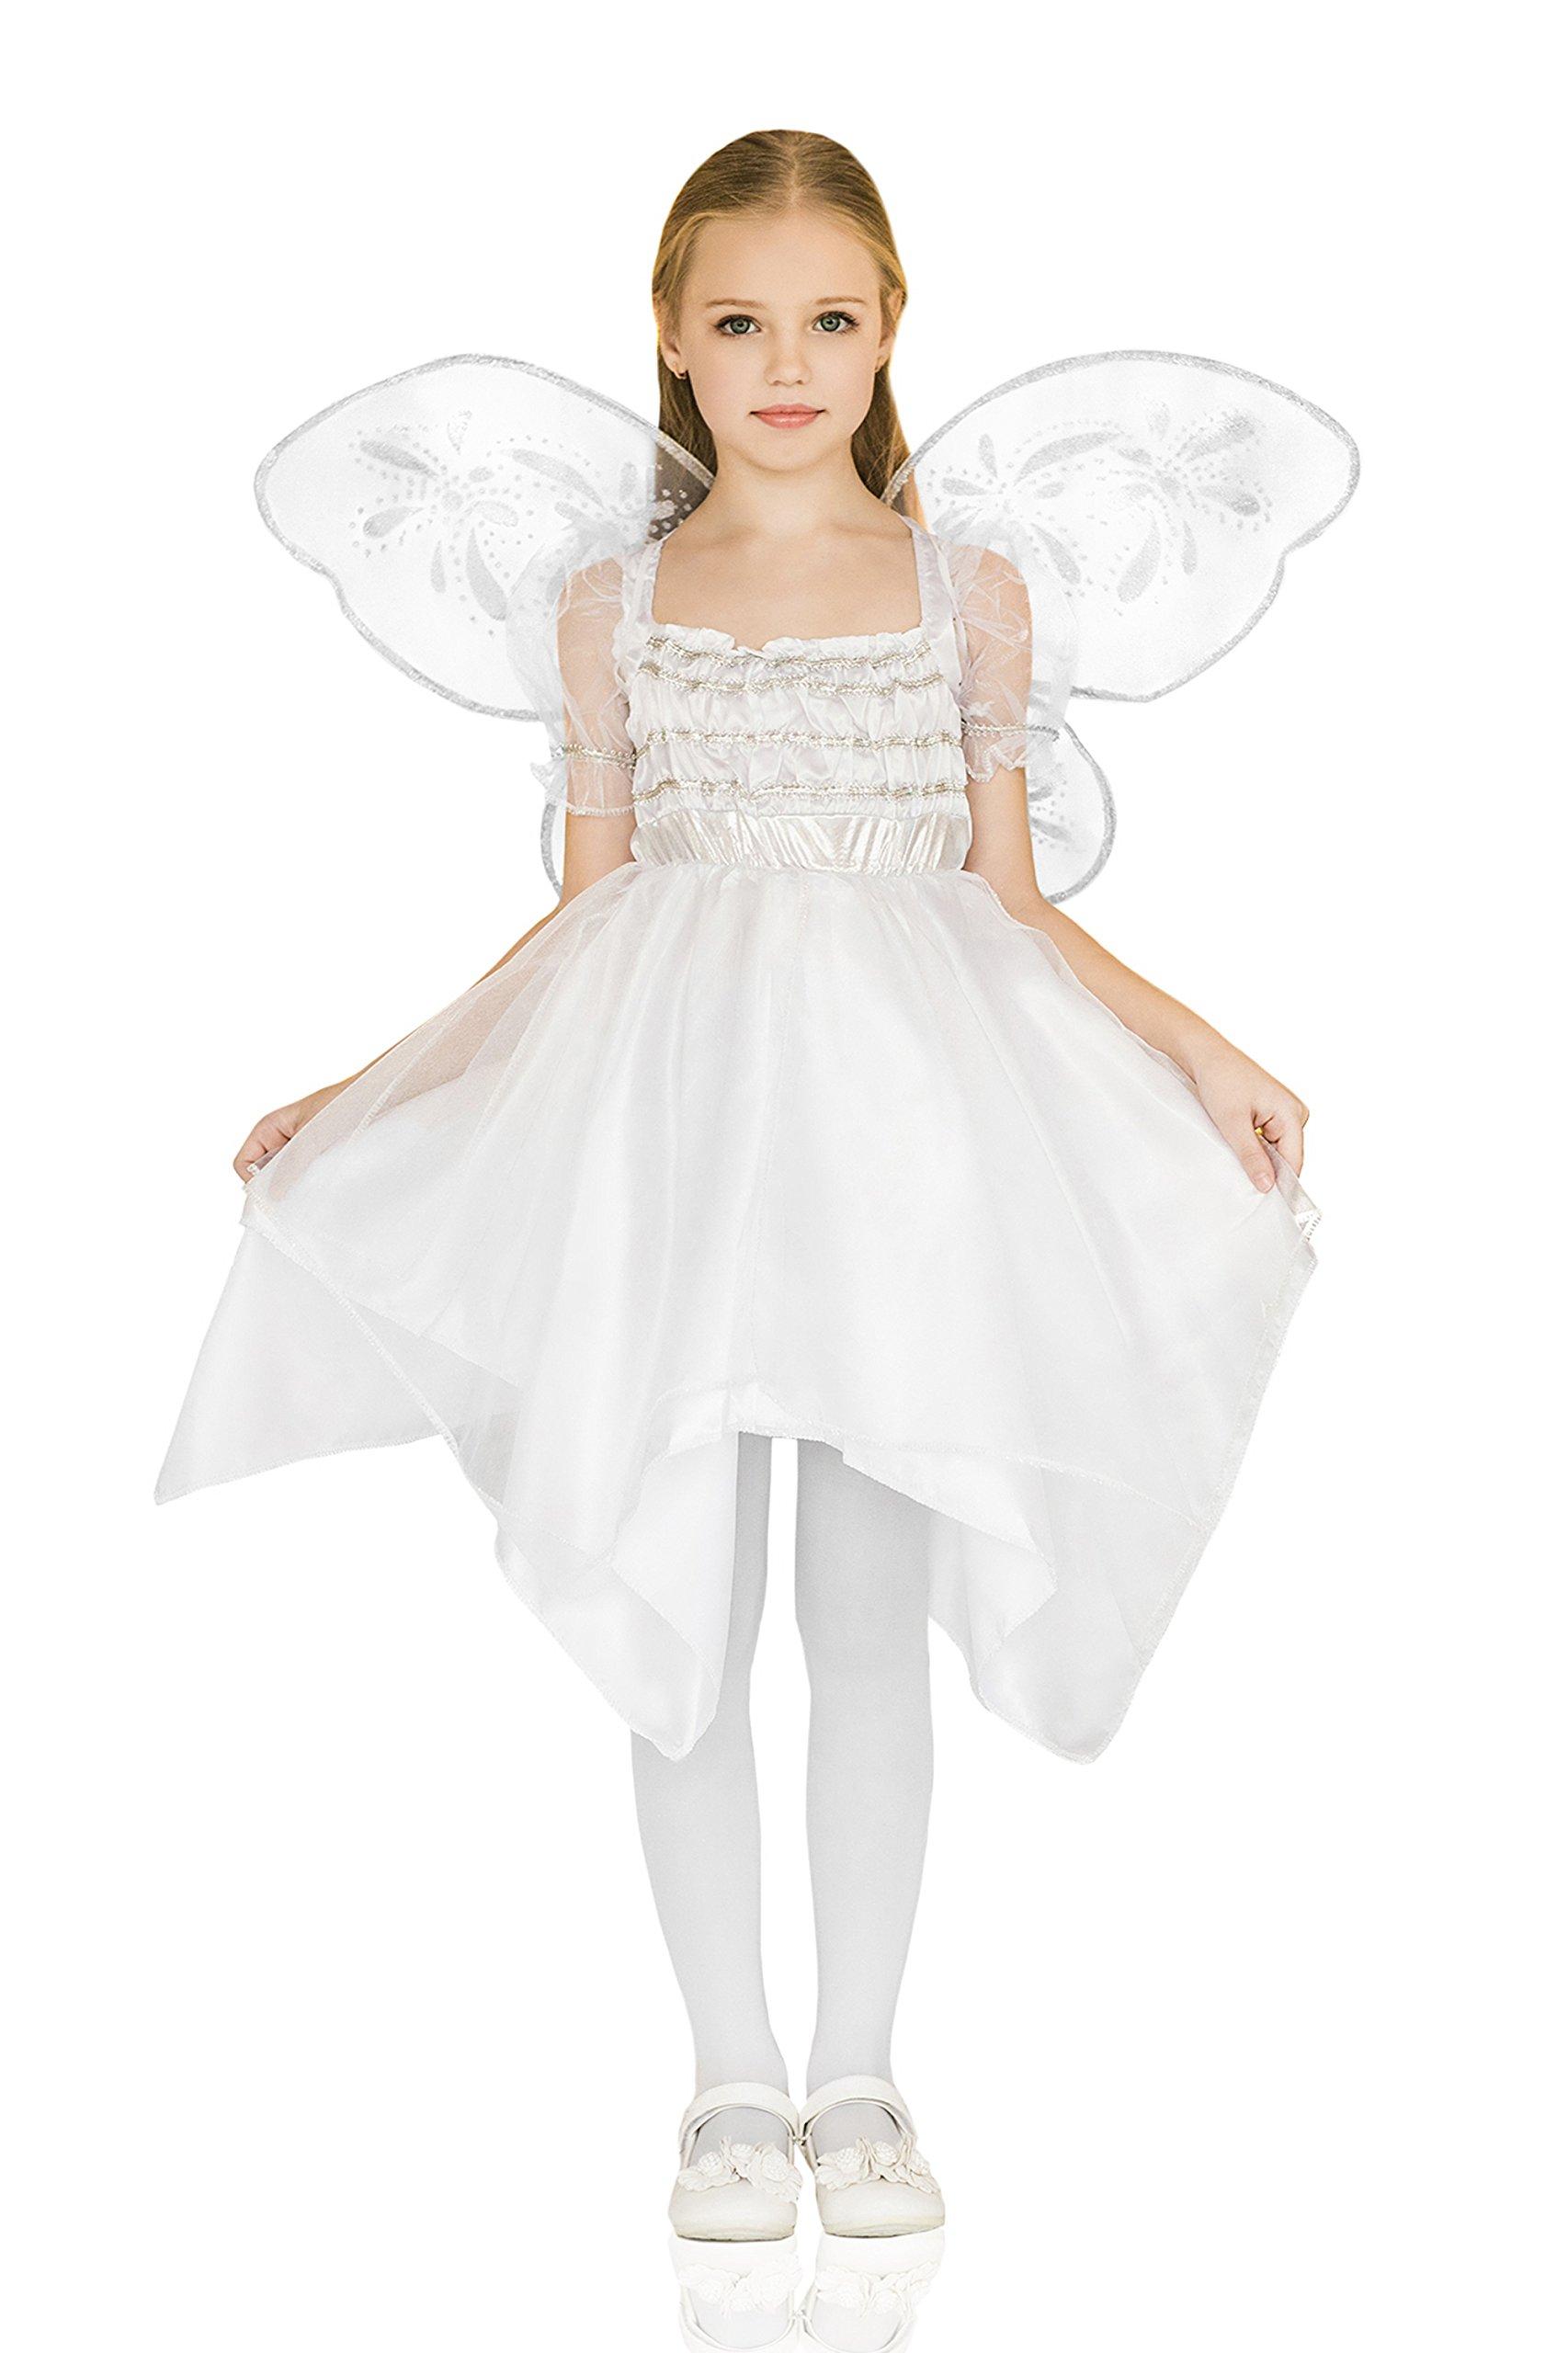 kids girls elegant angel halloween costume cherub butterfly dress up role play - Kids Angel Halloween Costume